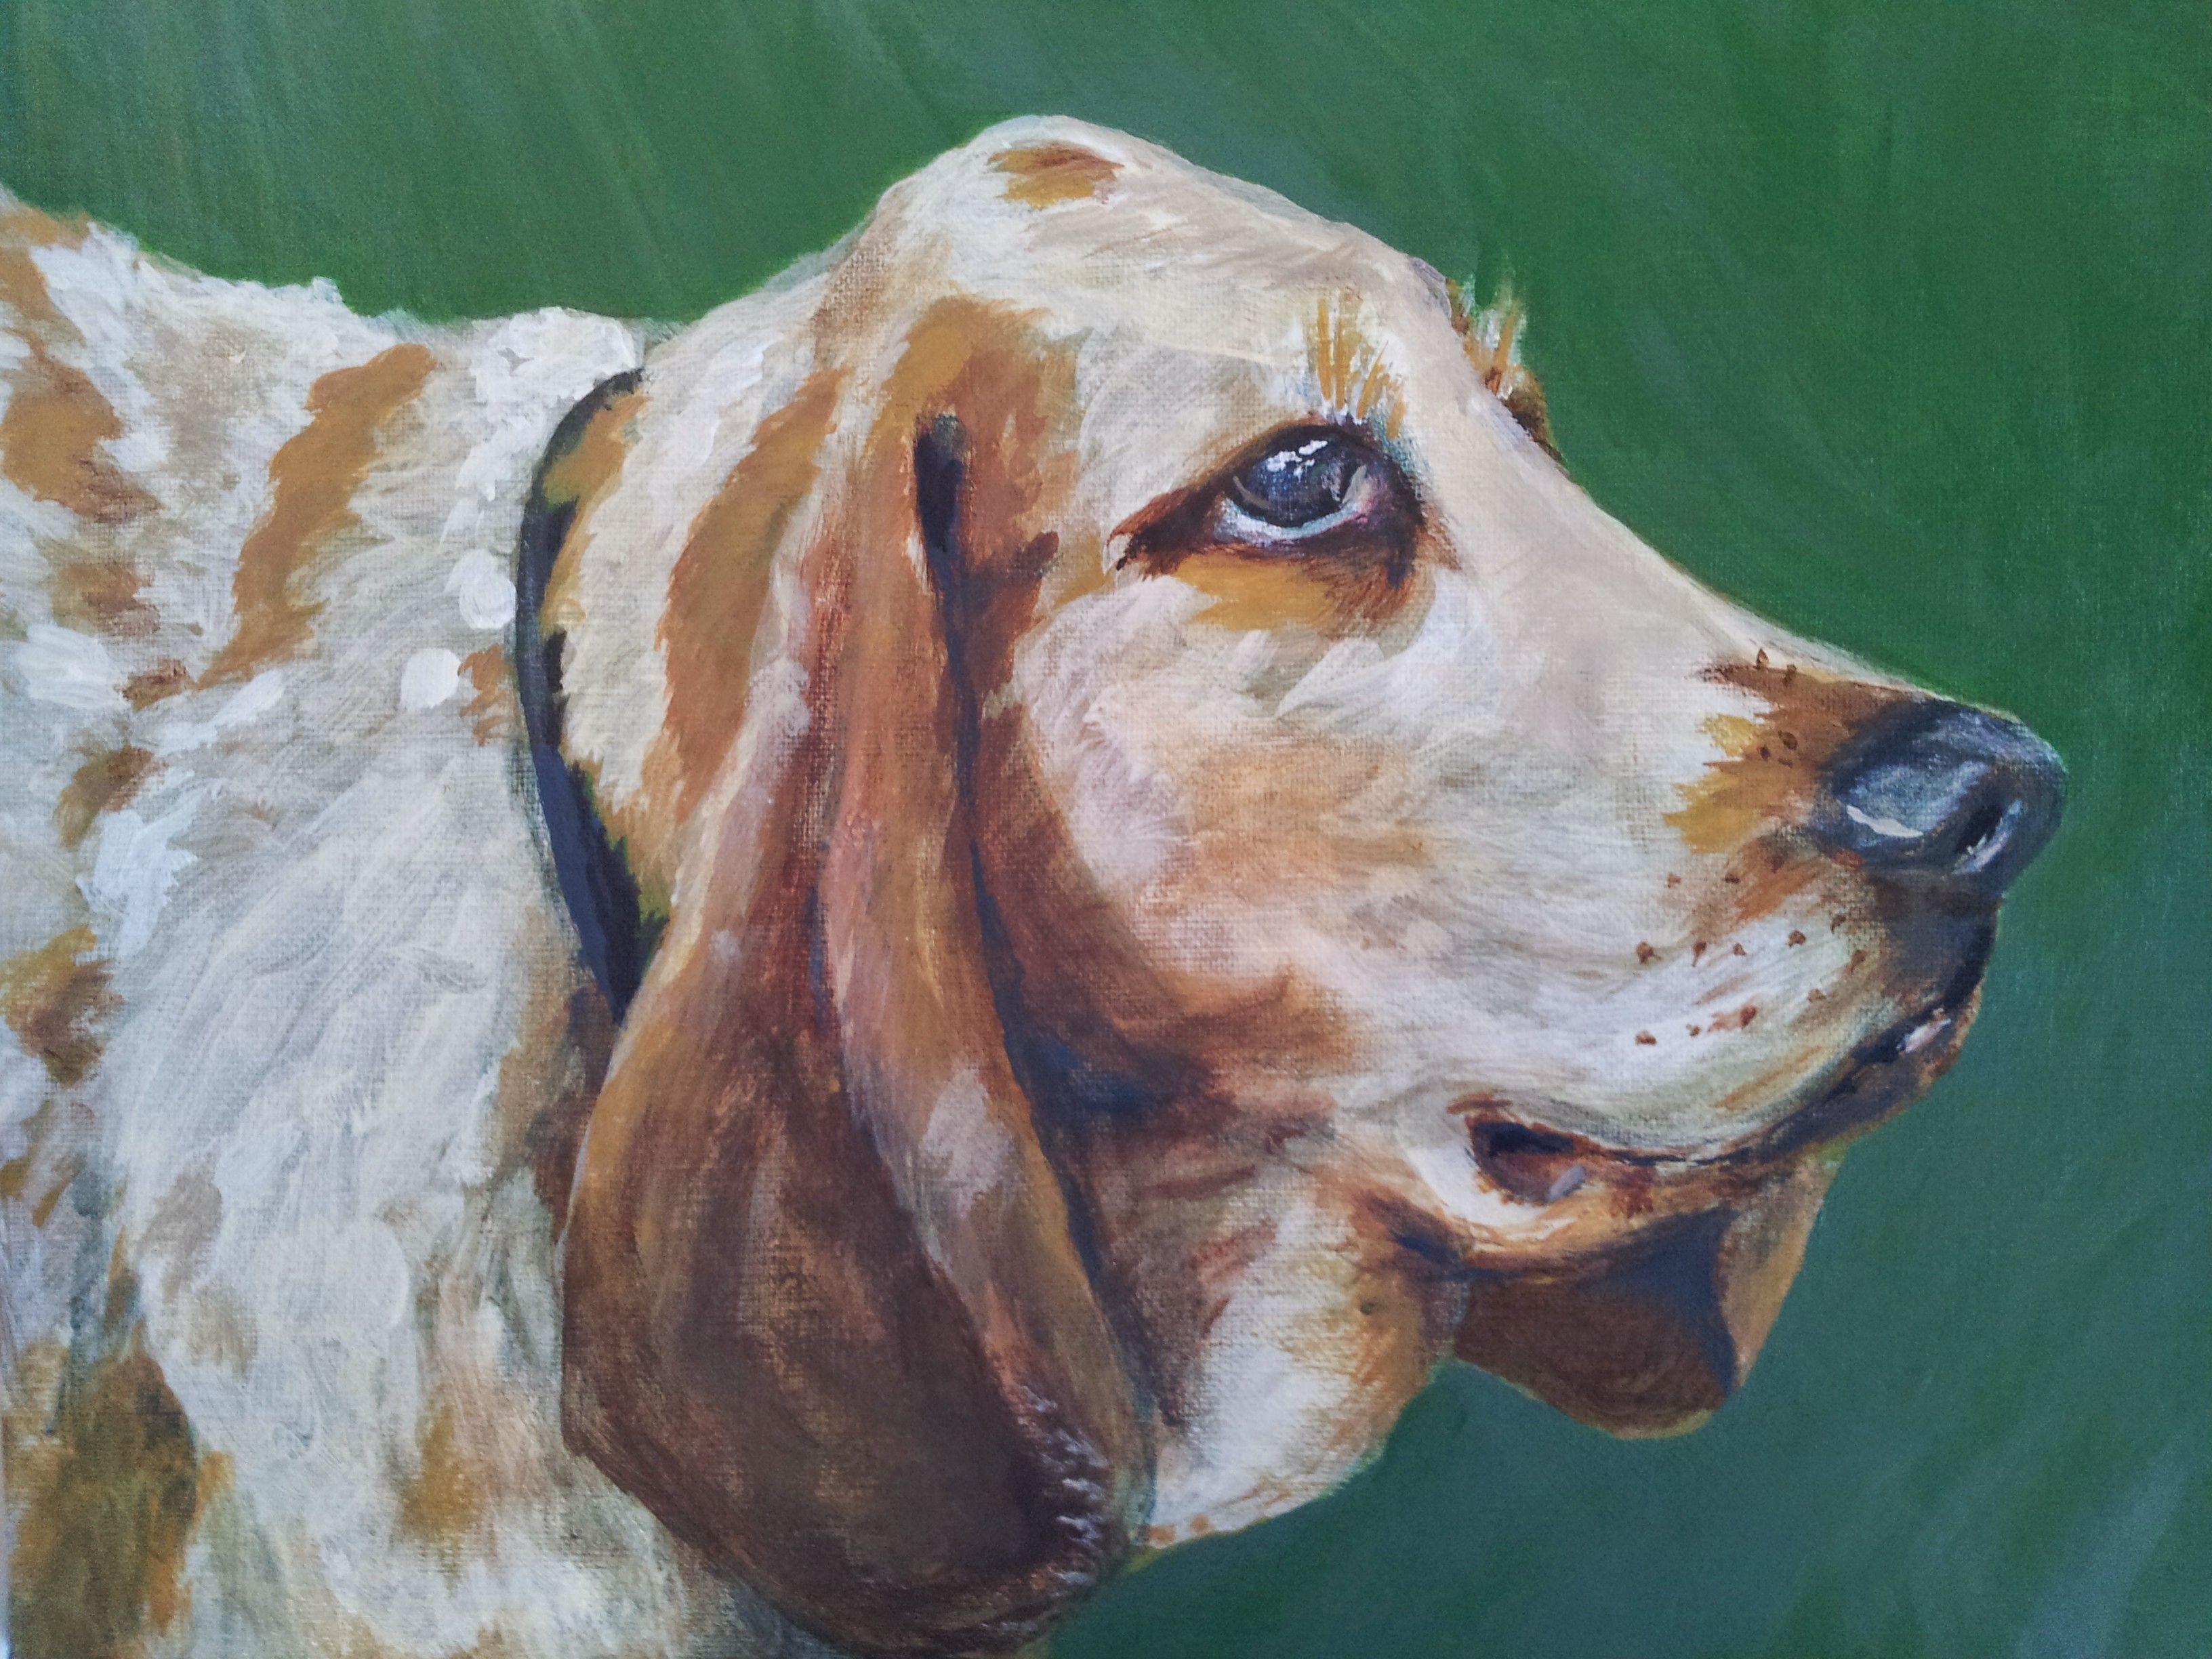 Bassett Hound Bassett hound, Hound, Bassett